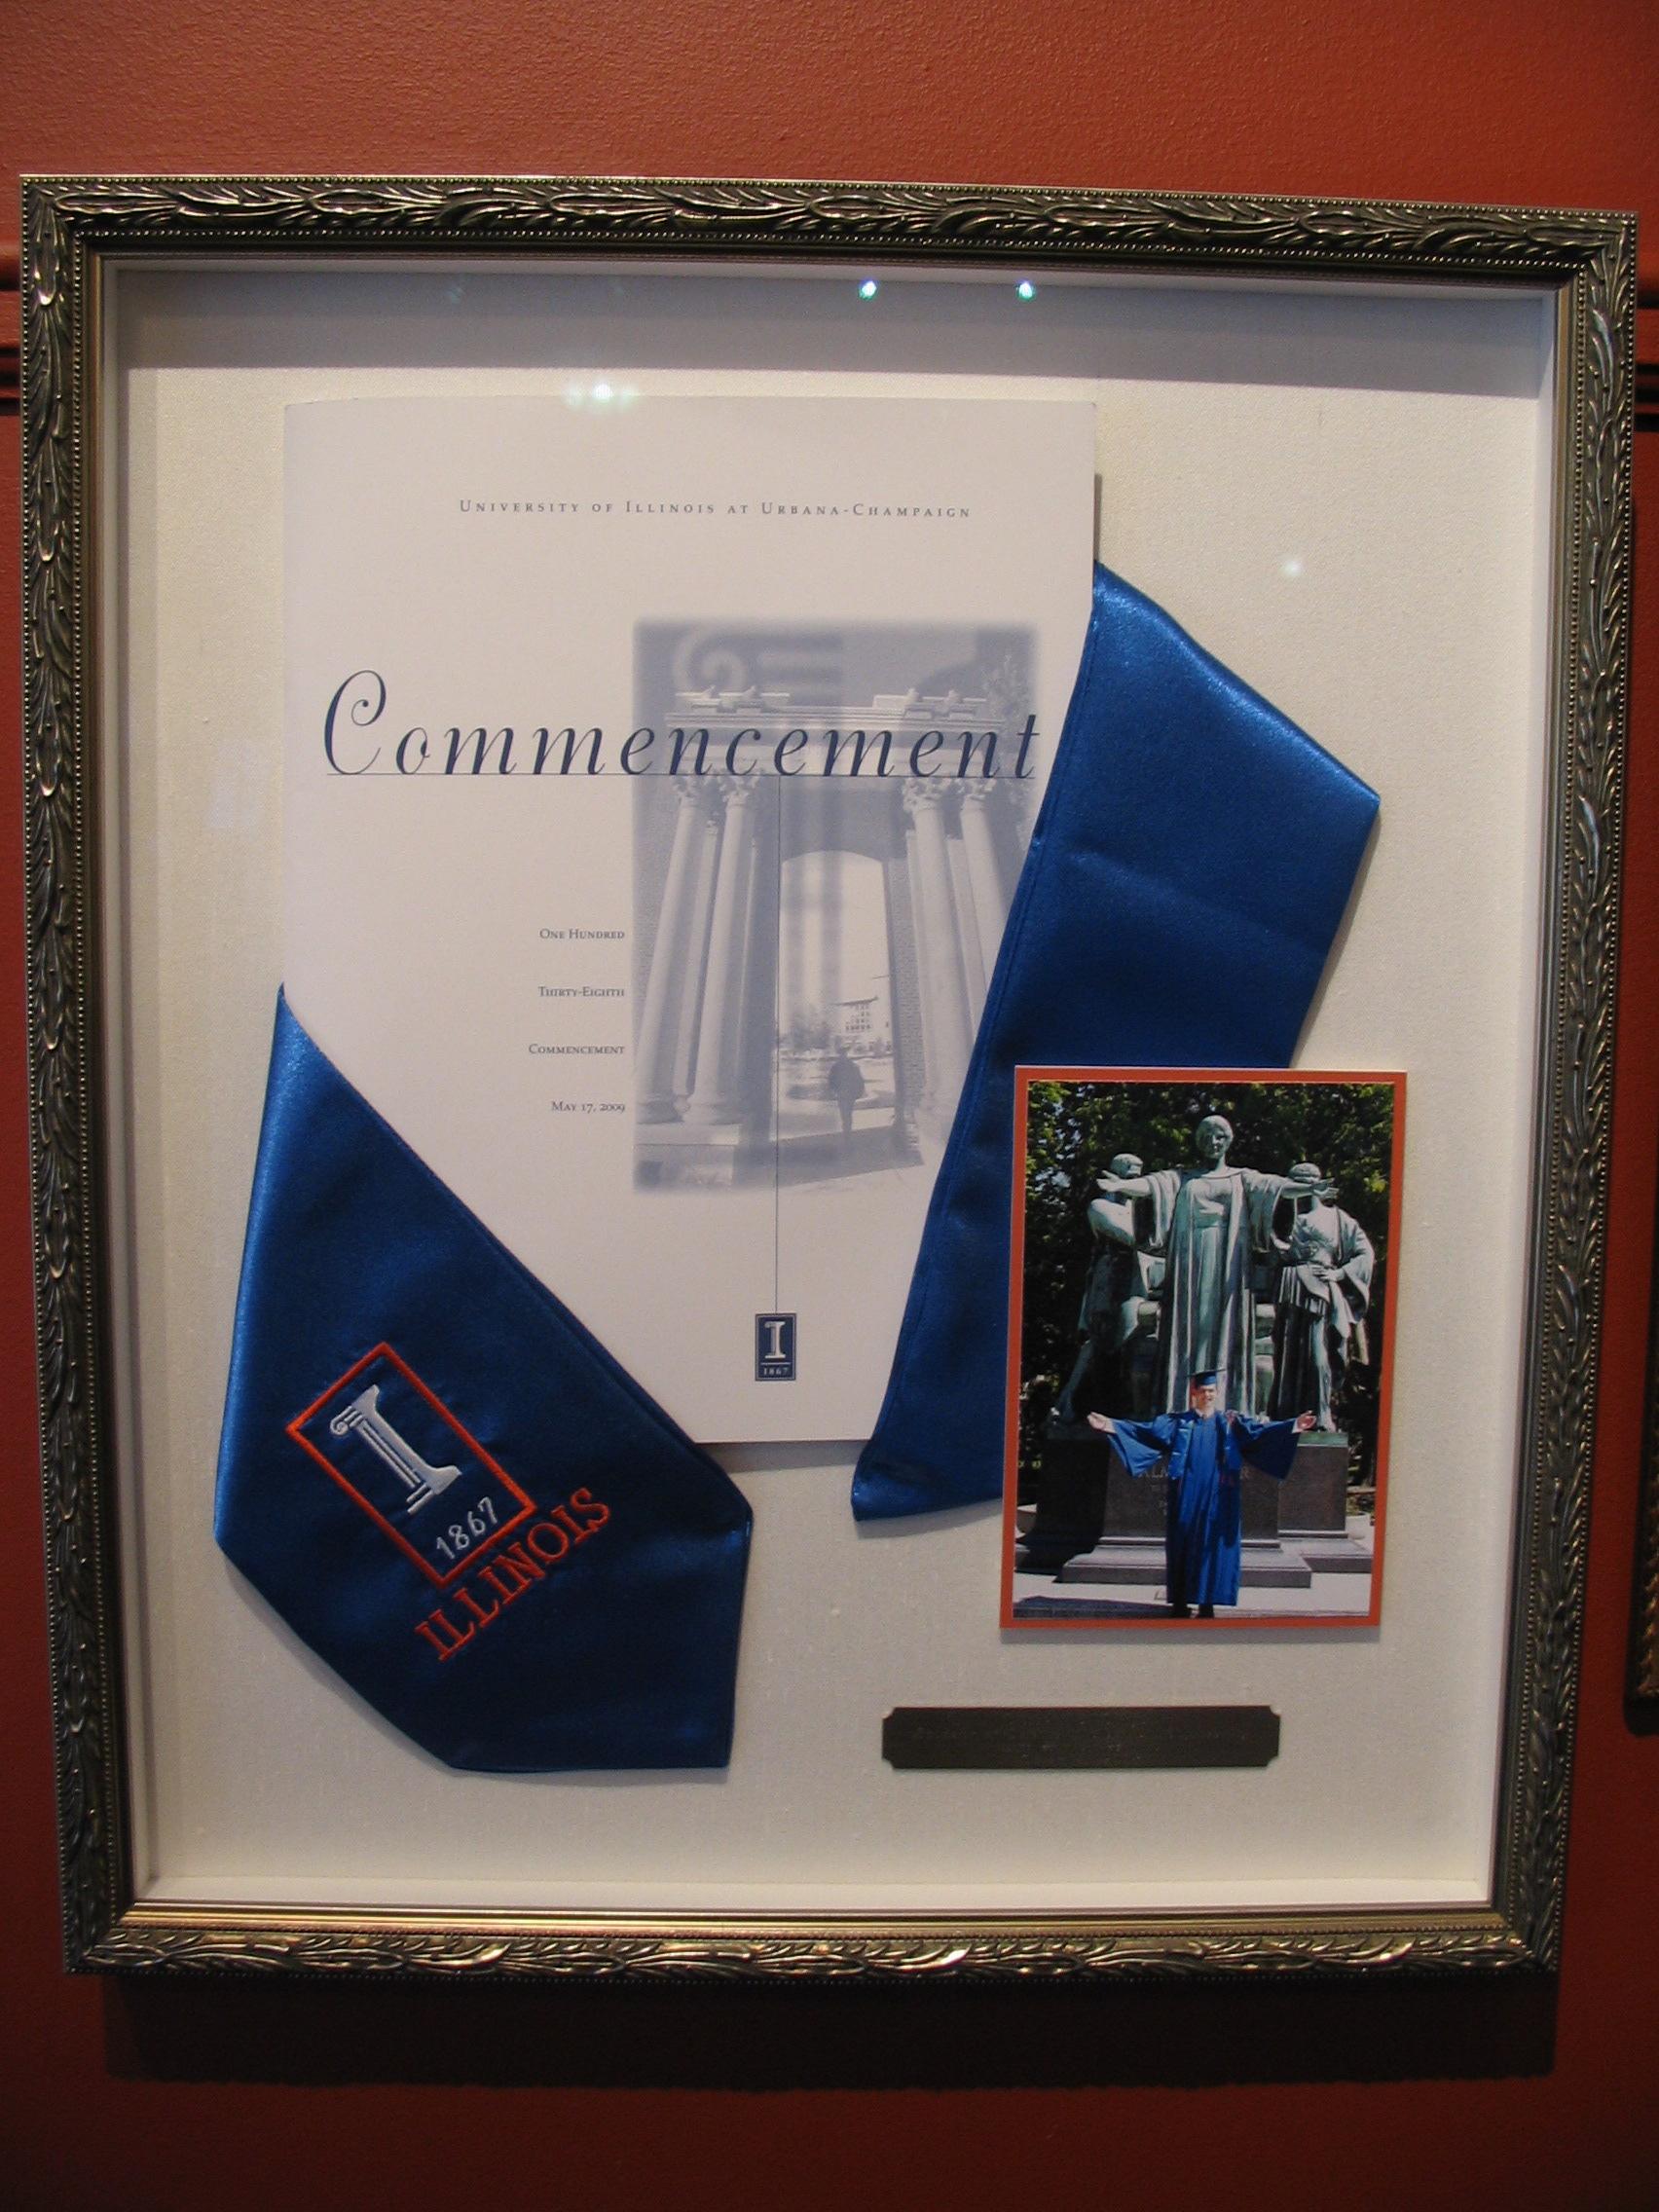 University of Illinois framed by The Framemakers